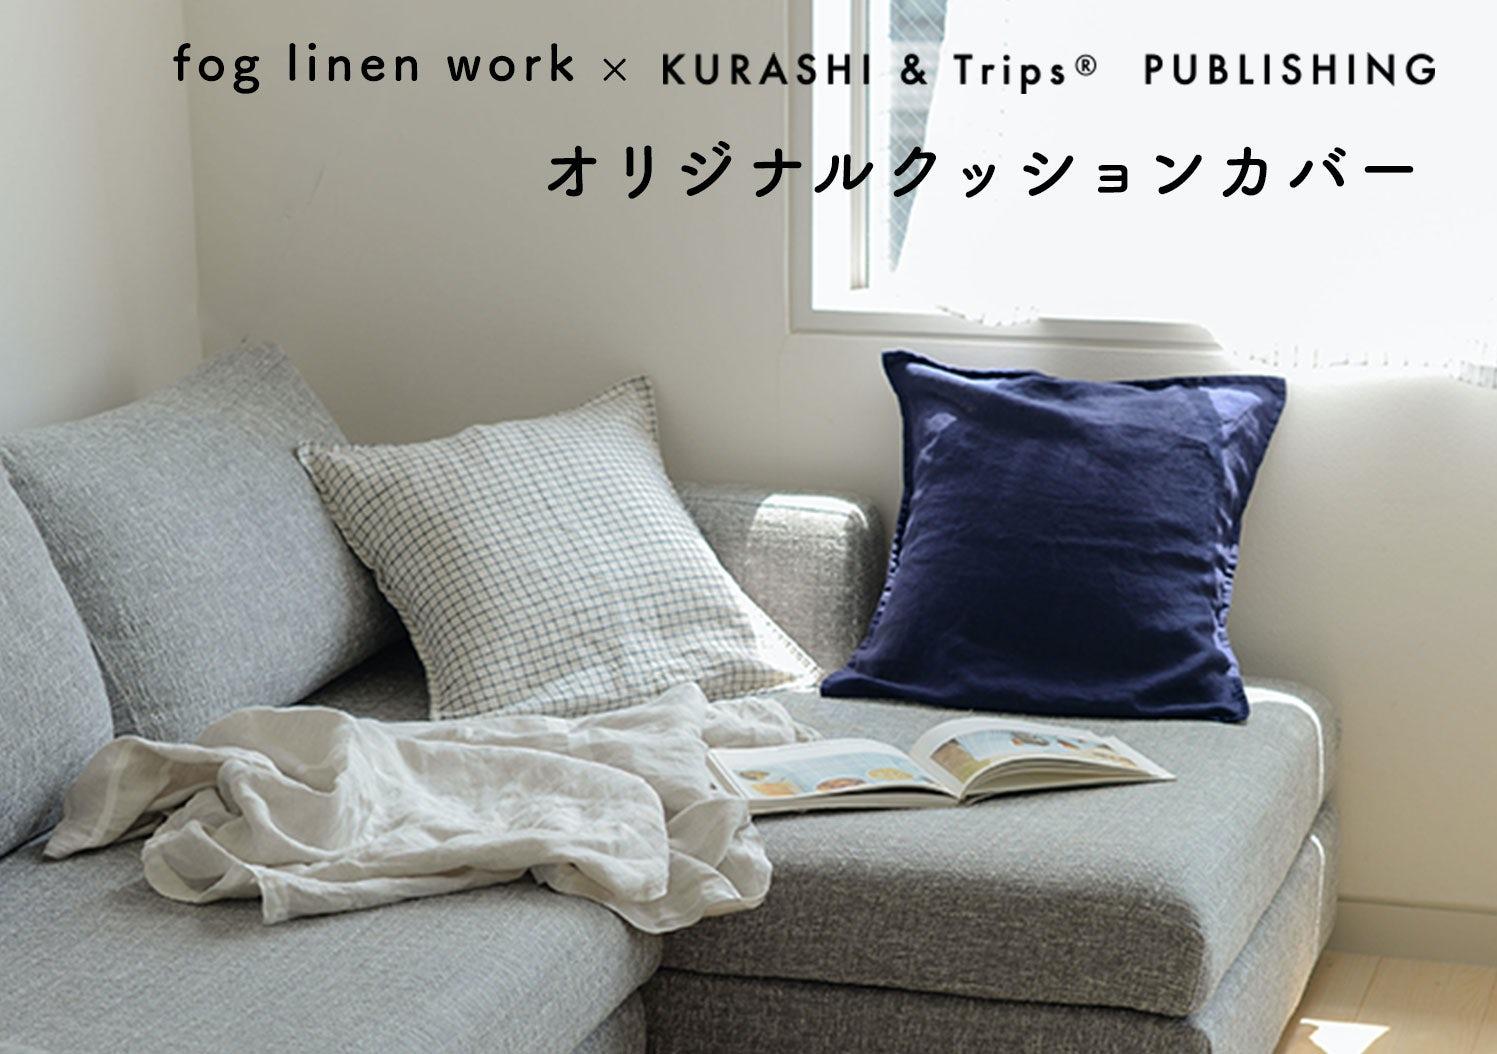 fog linen work × KURASHI&Trips PUBLISHING / クッションカバーの画像